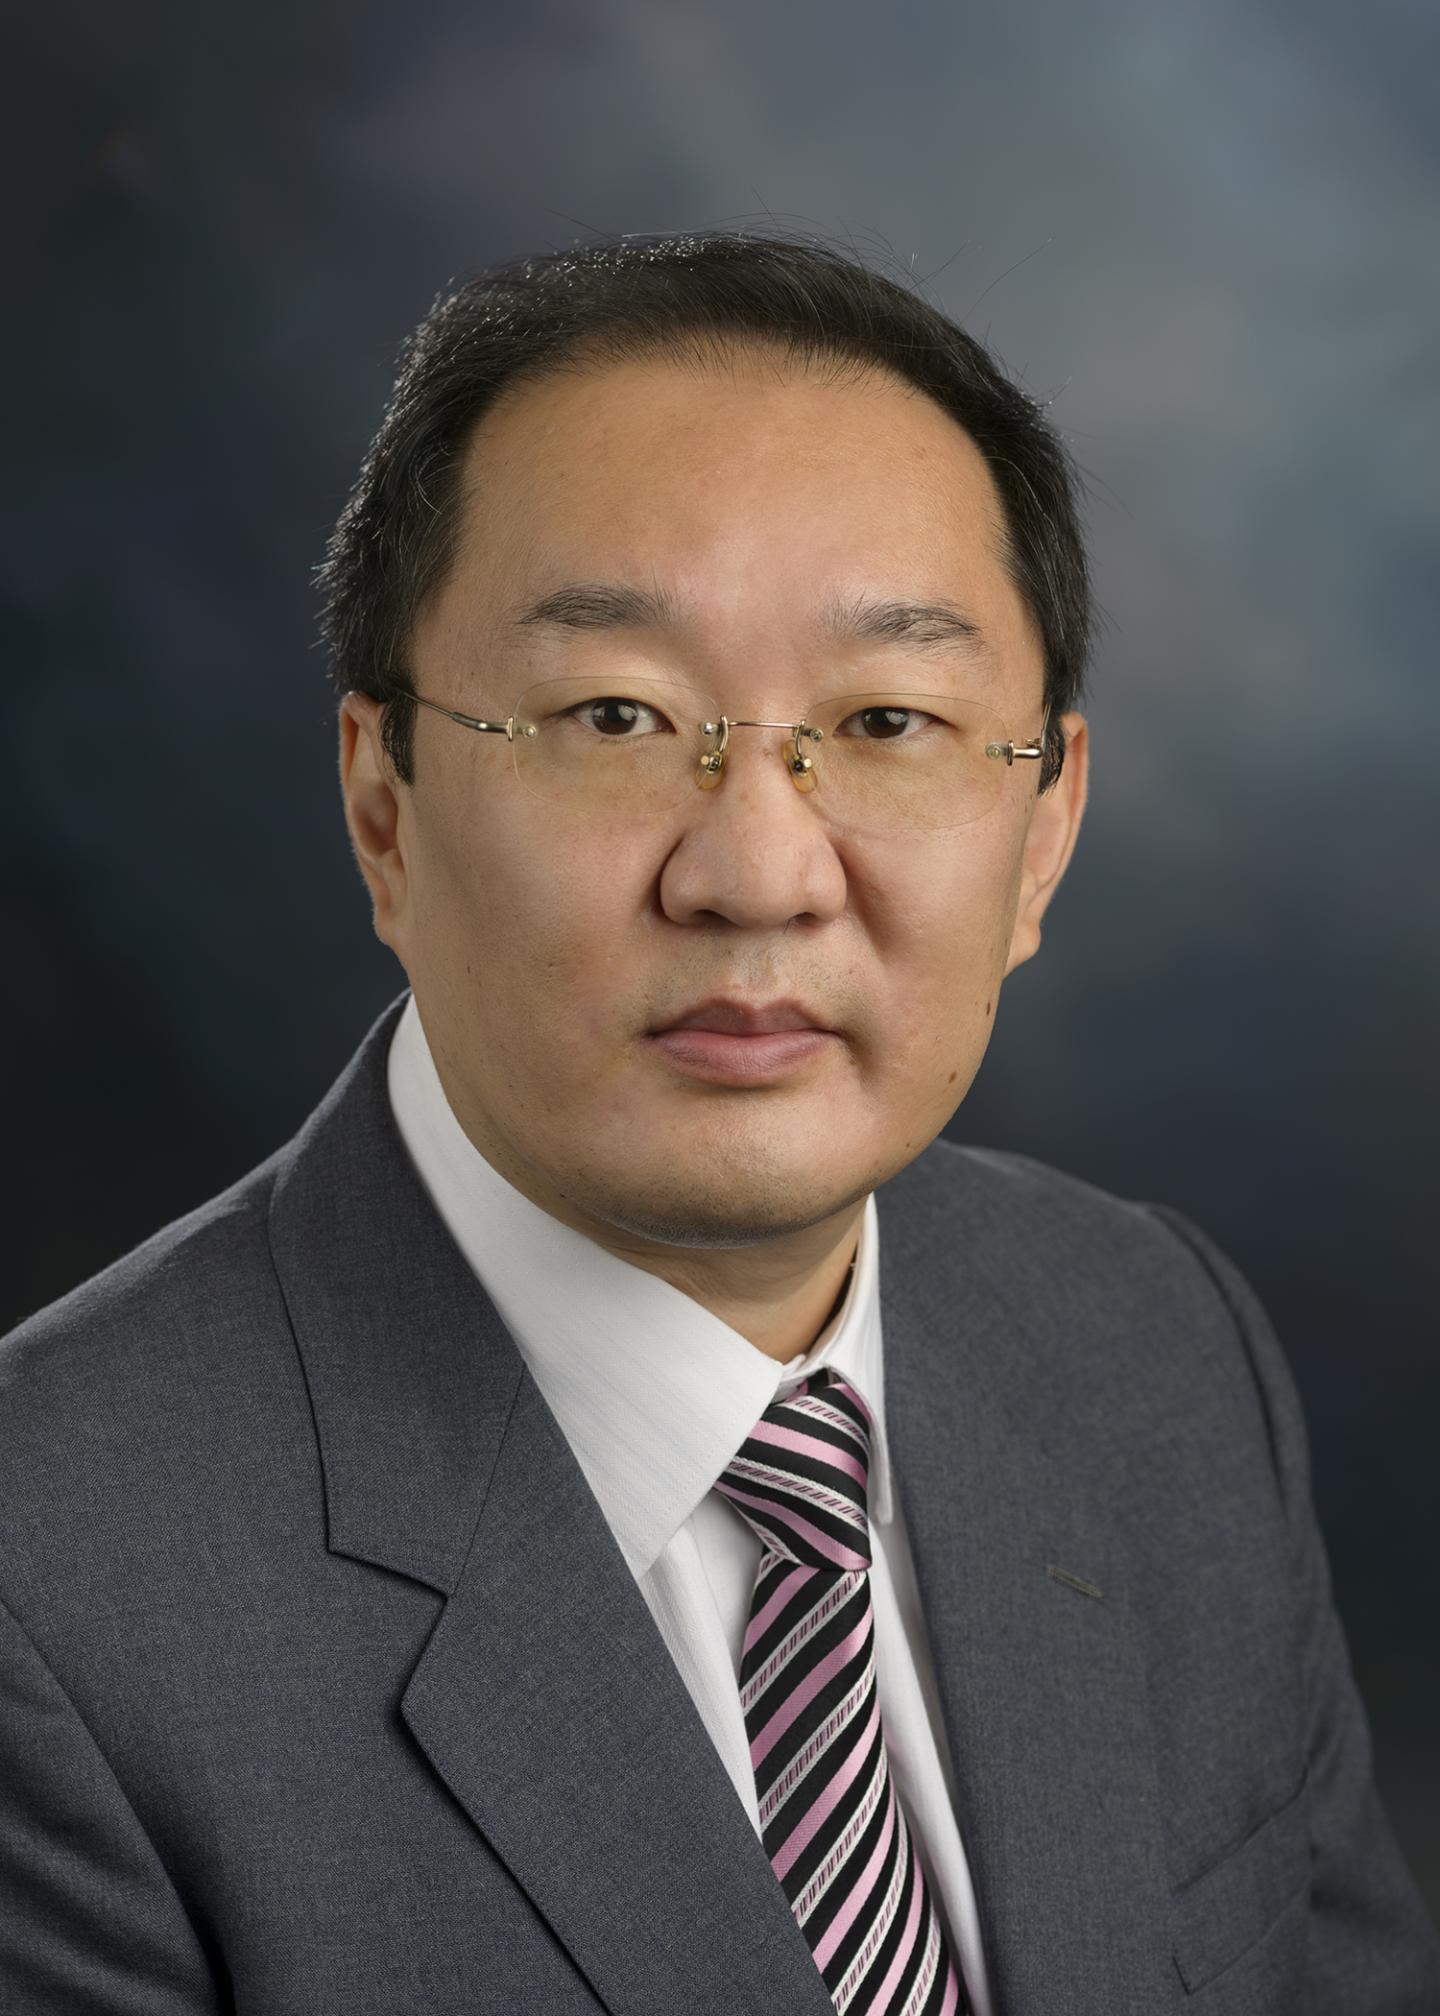 Vitaly Ryu, Georgia State University